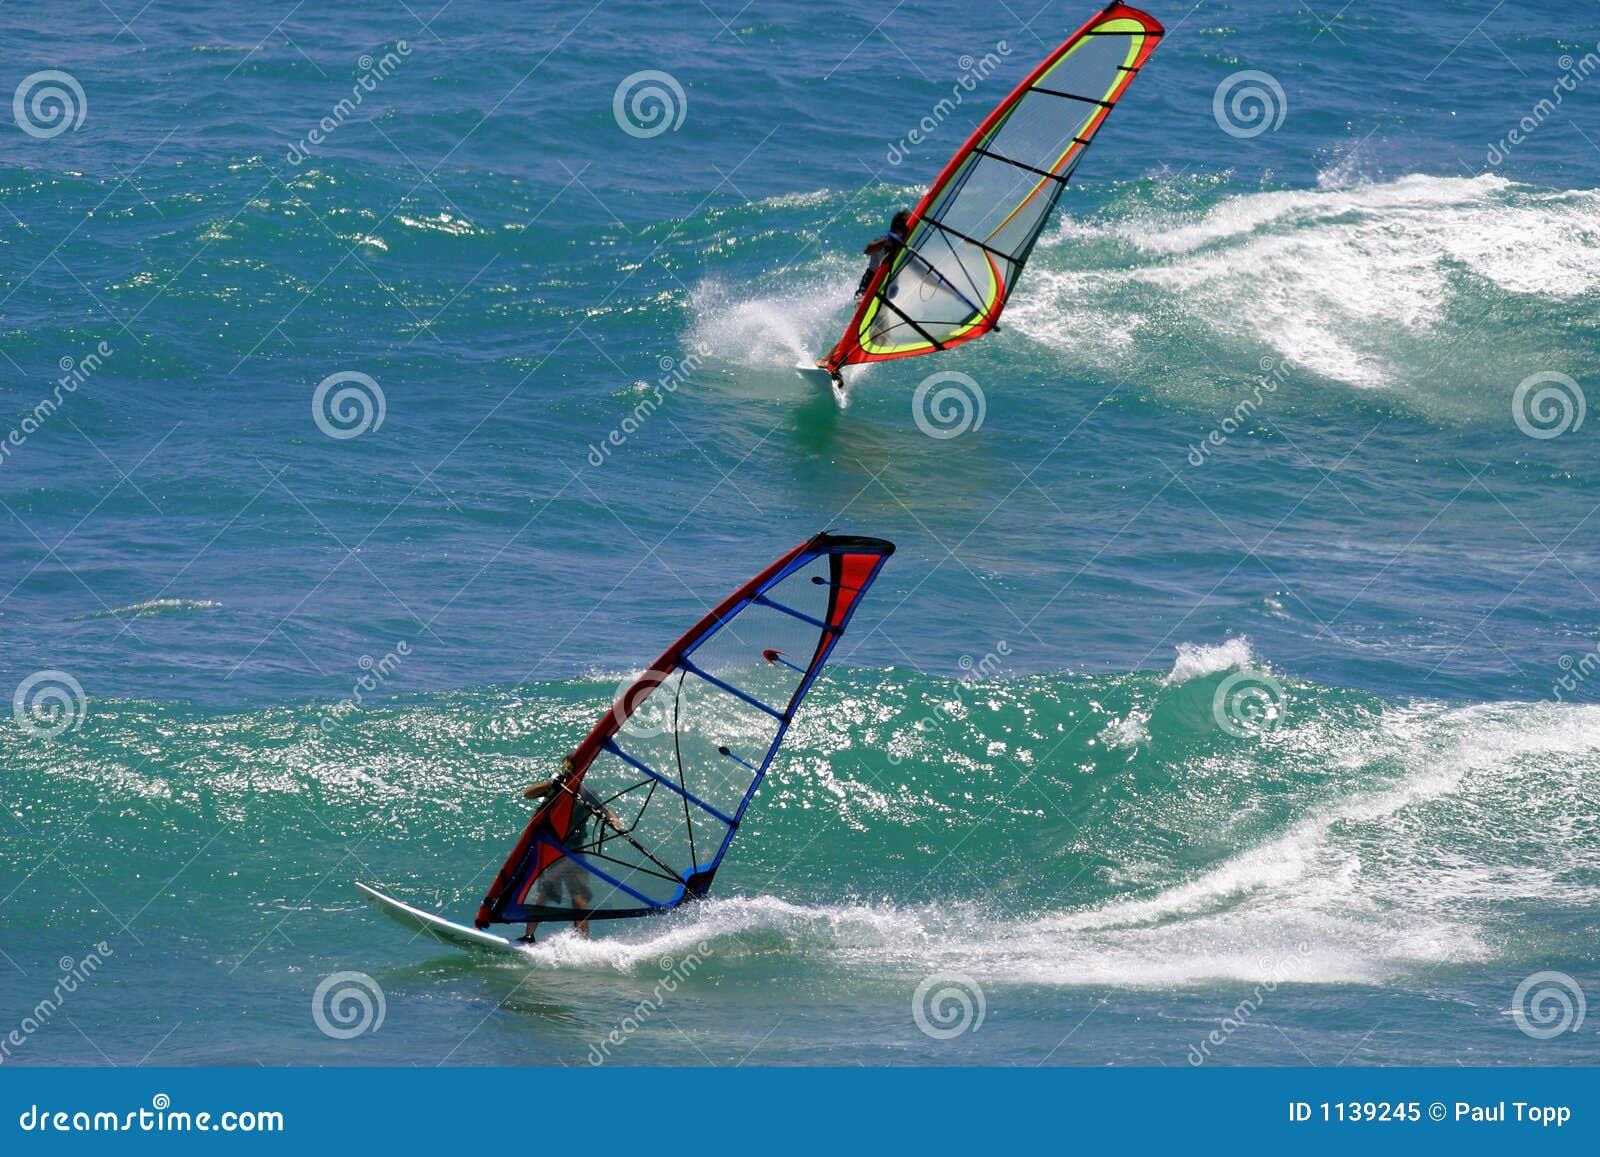 Two Windsurfers Windsurfing In Hawaii Stock Image - Image of board